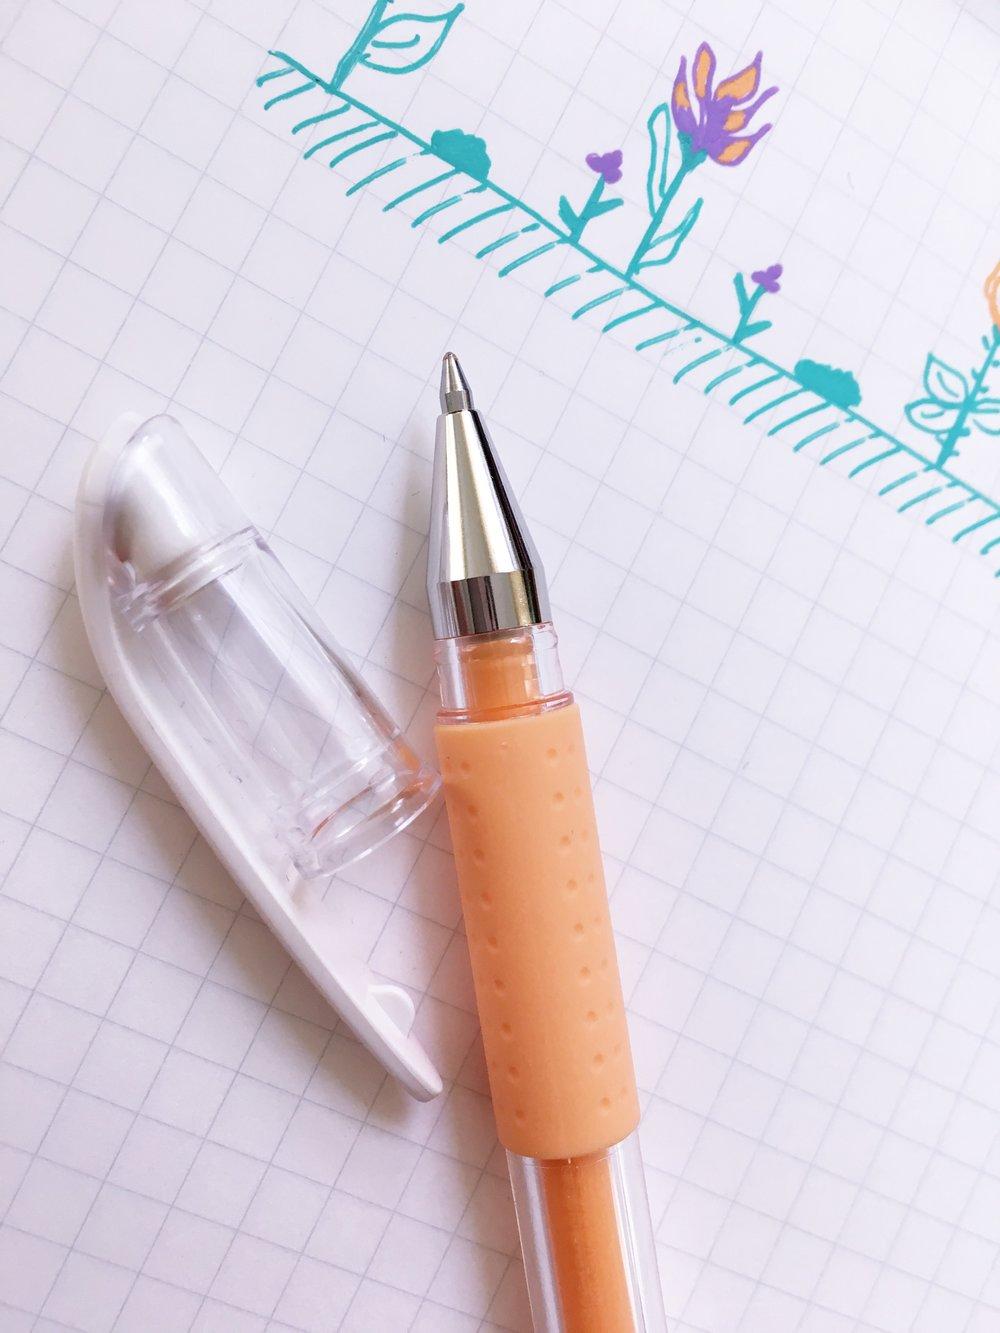 Uni-ball Signo DX Pastel Gel Pen